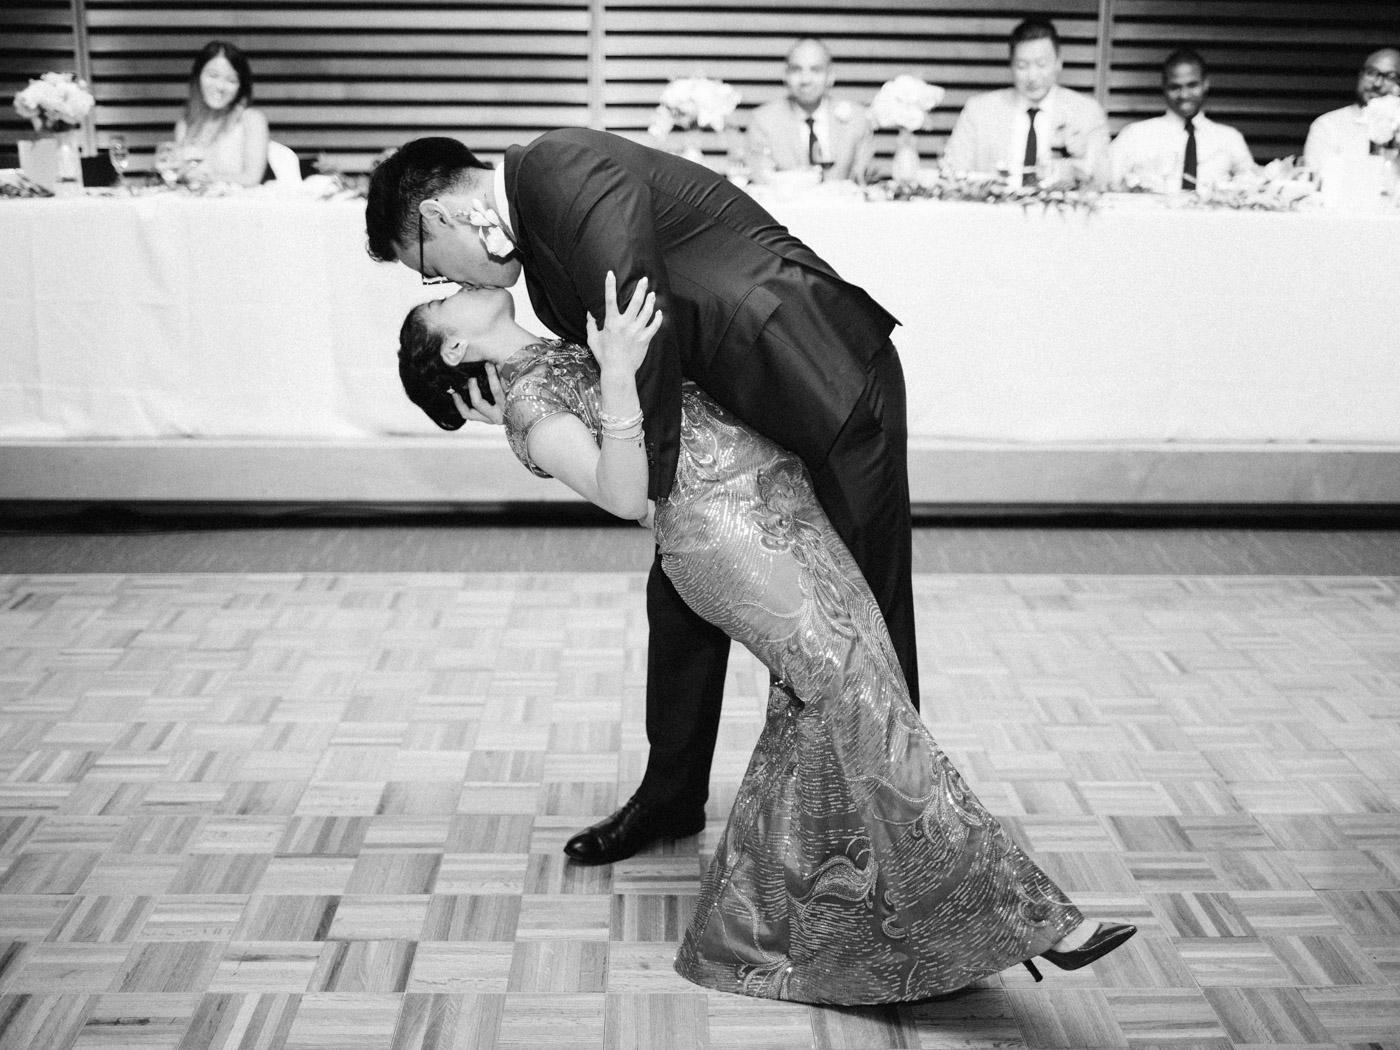 toronto_wedding_photographer_fine_art_documentary_photography-99.jpg